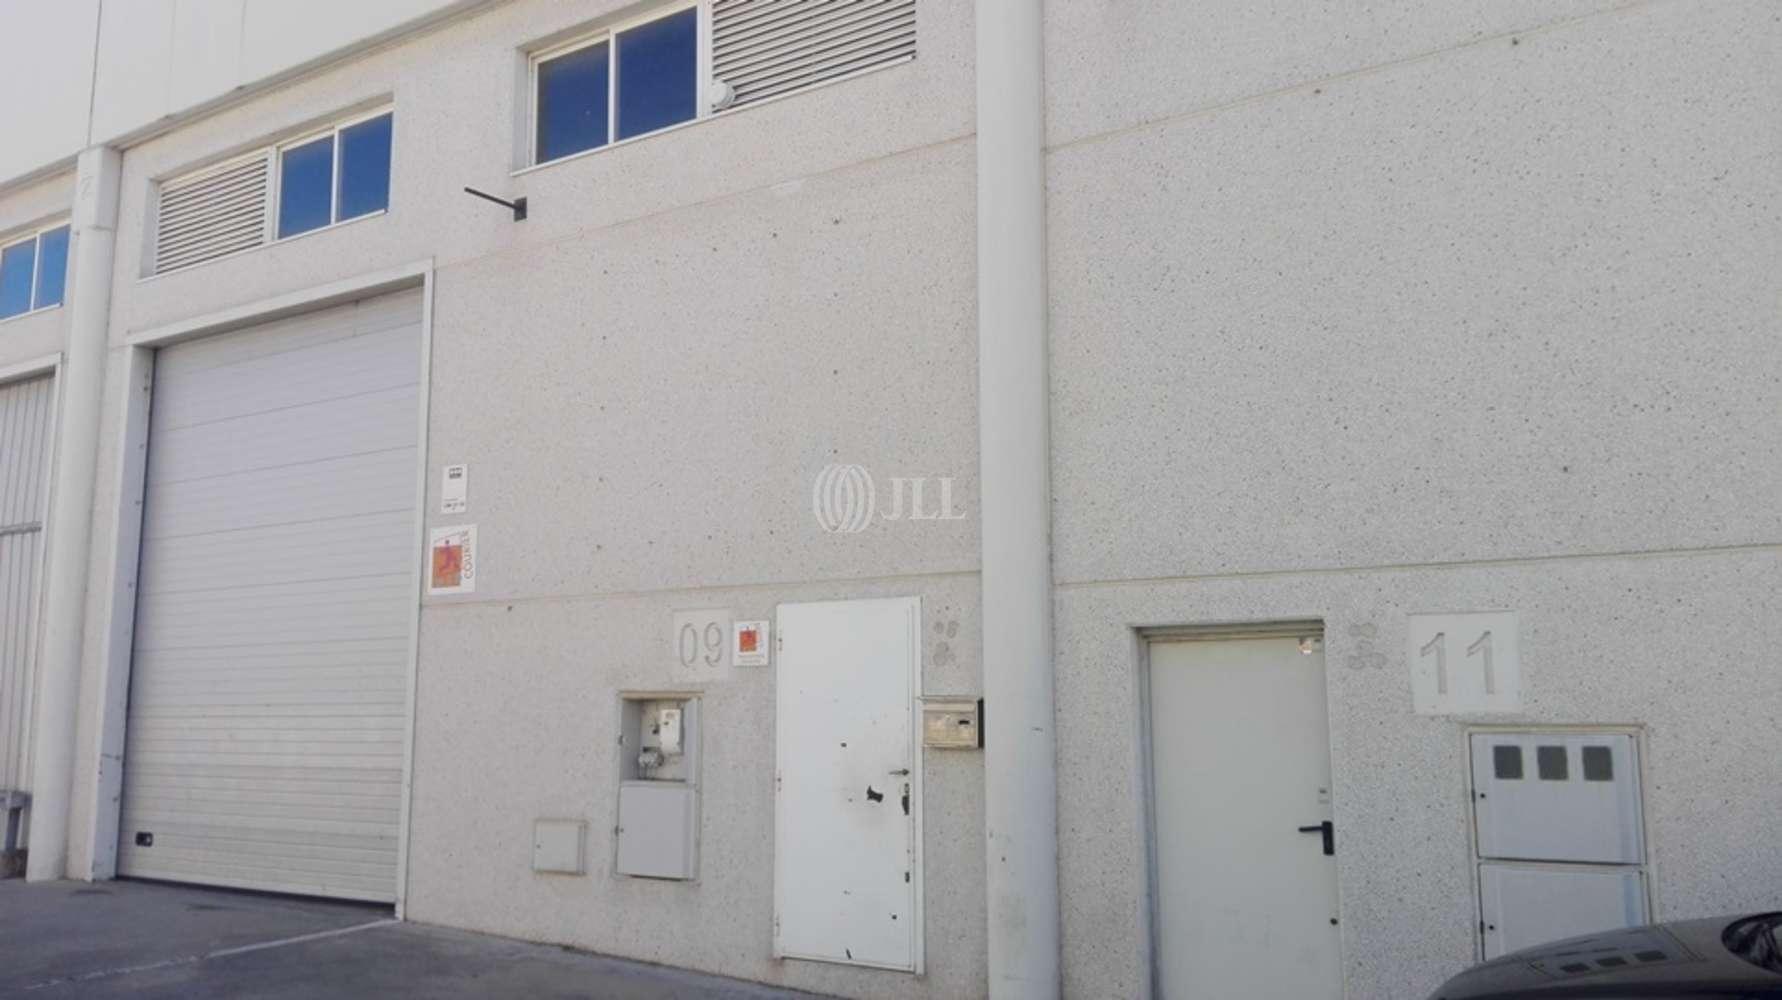 Naves industriales y logísticas Algete, 28110 - Nave Industrial - M0336 MINI NAVE EN ALGETE - 9300